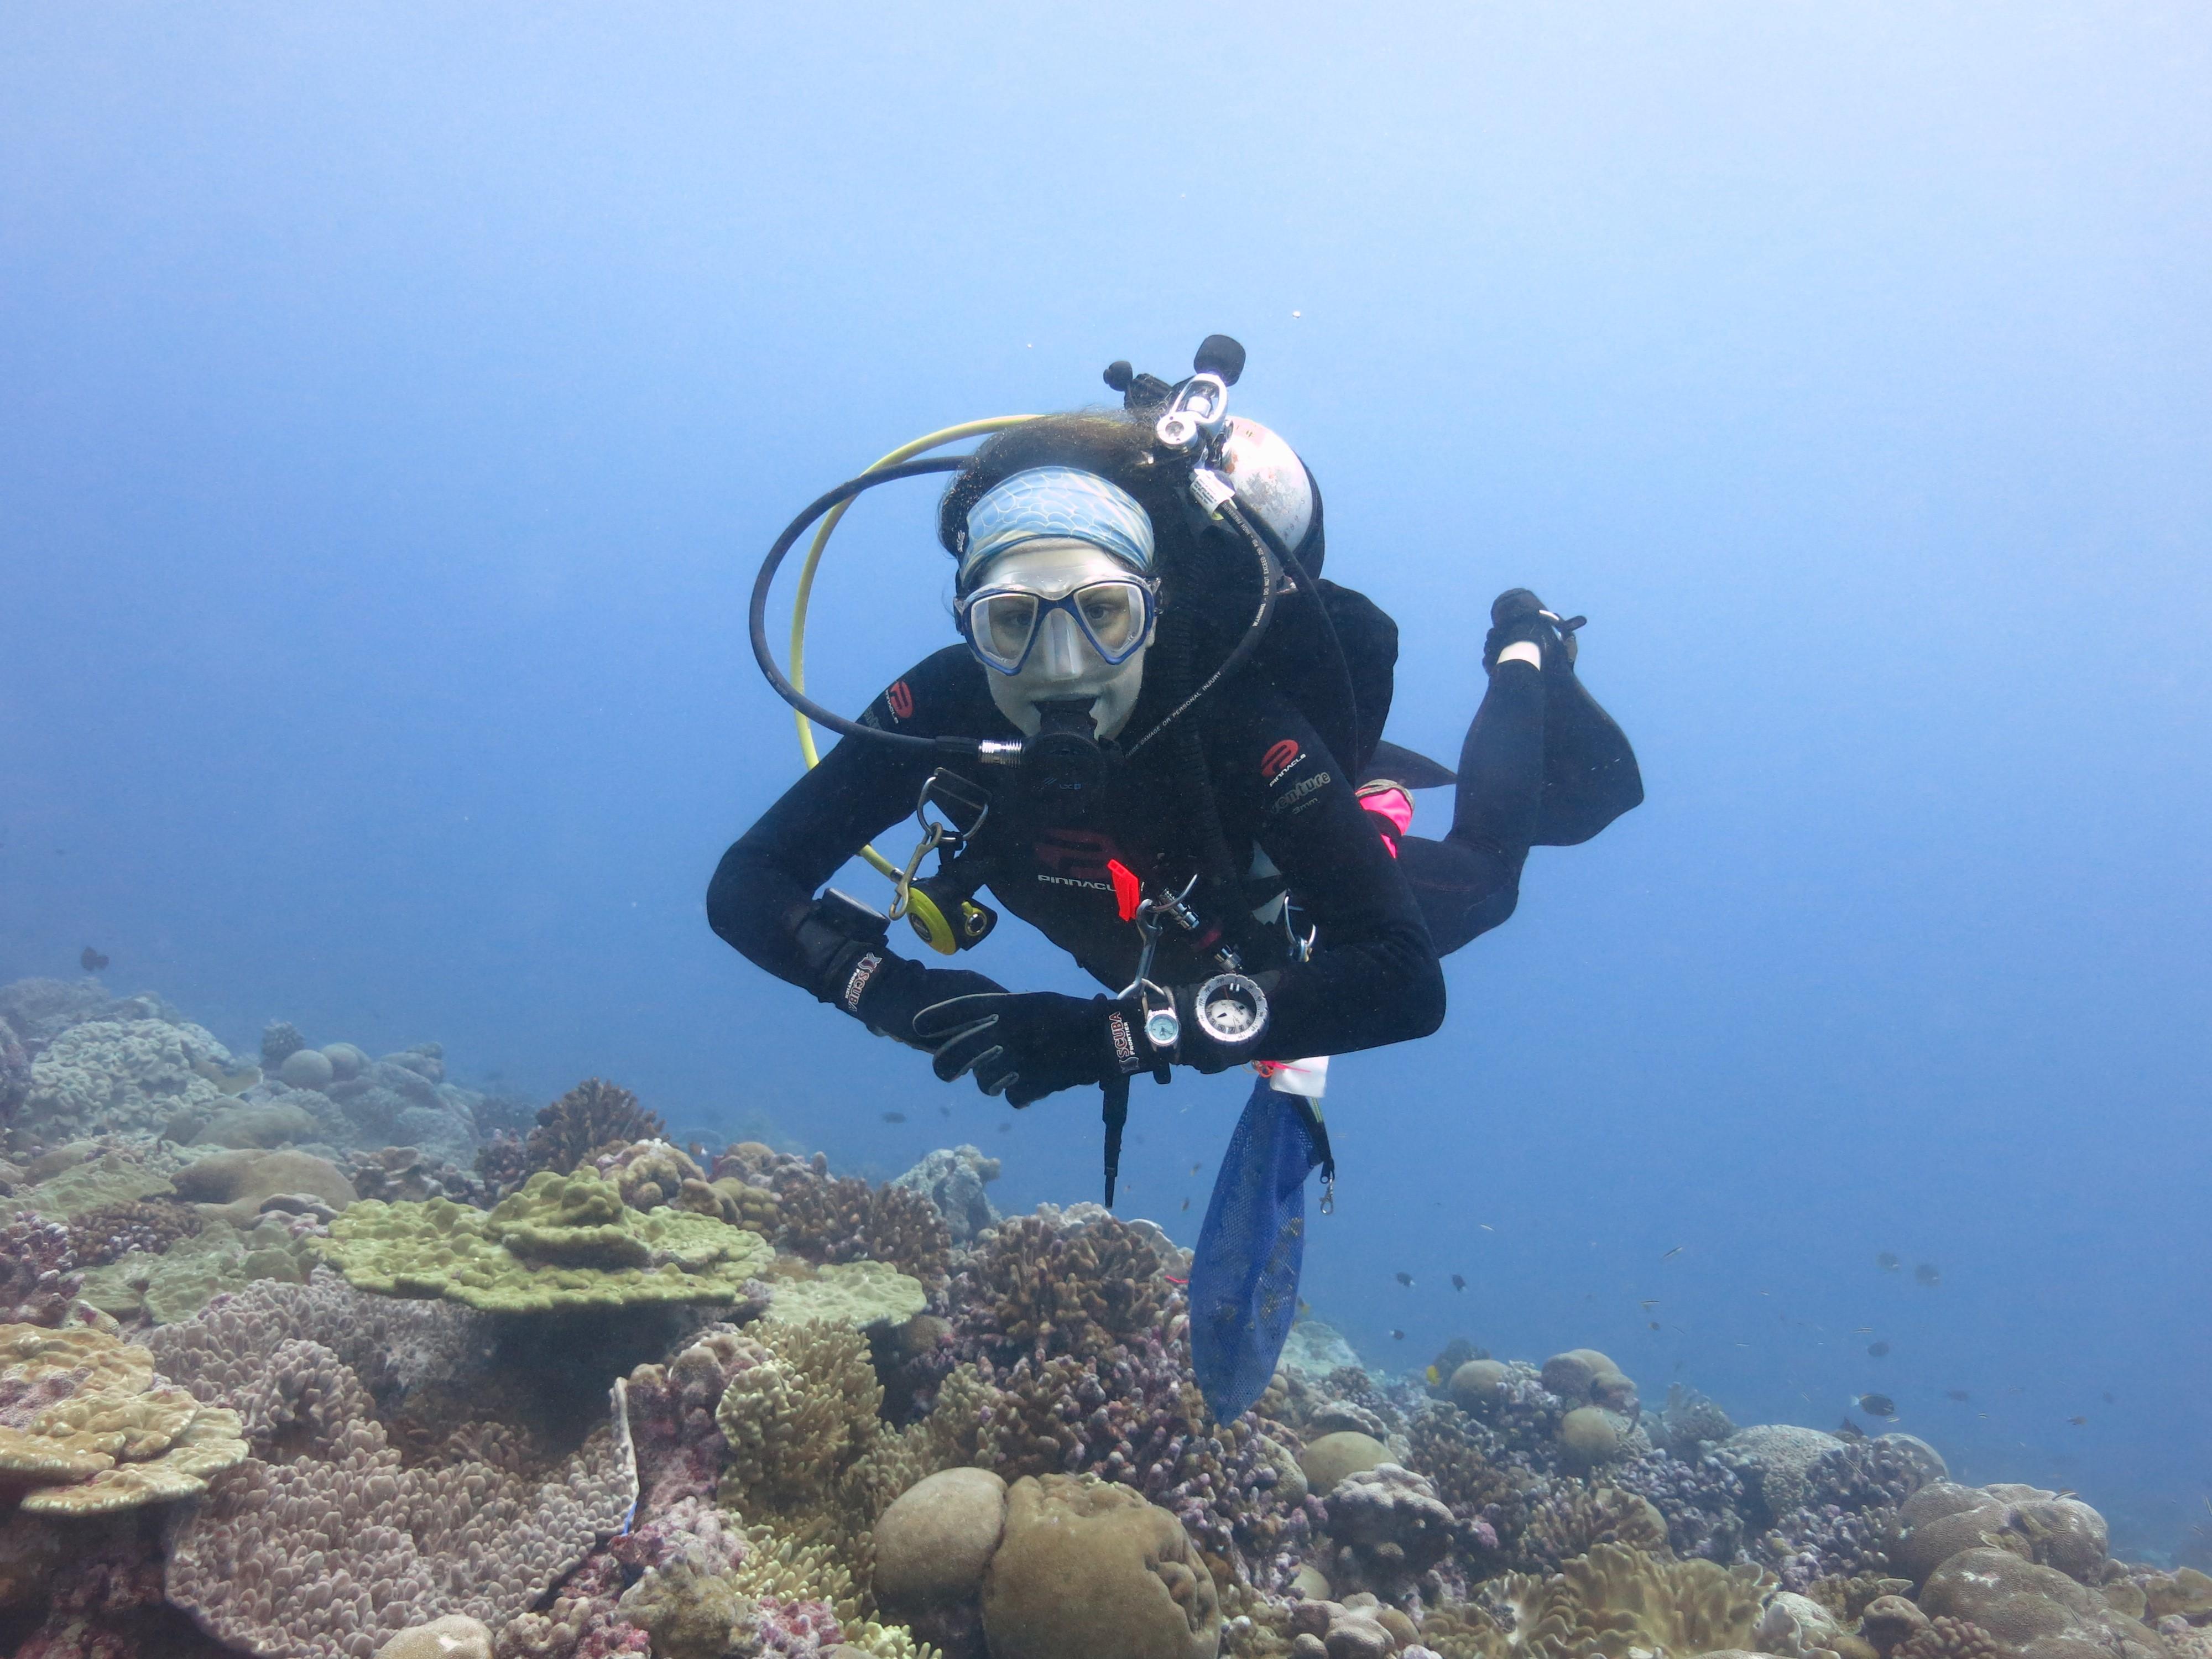 Claar scuba dives near corals